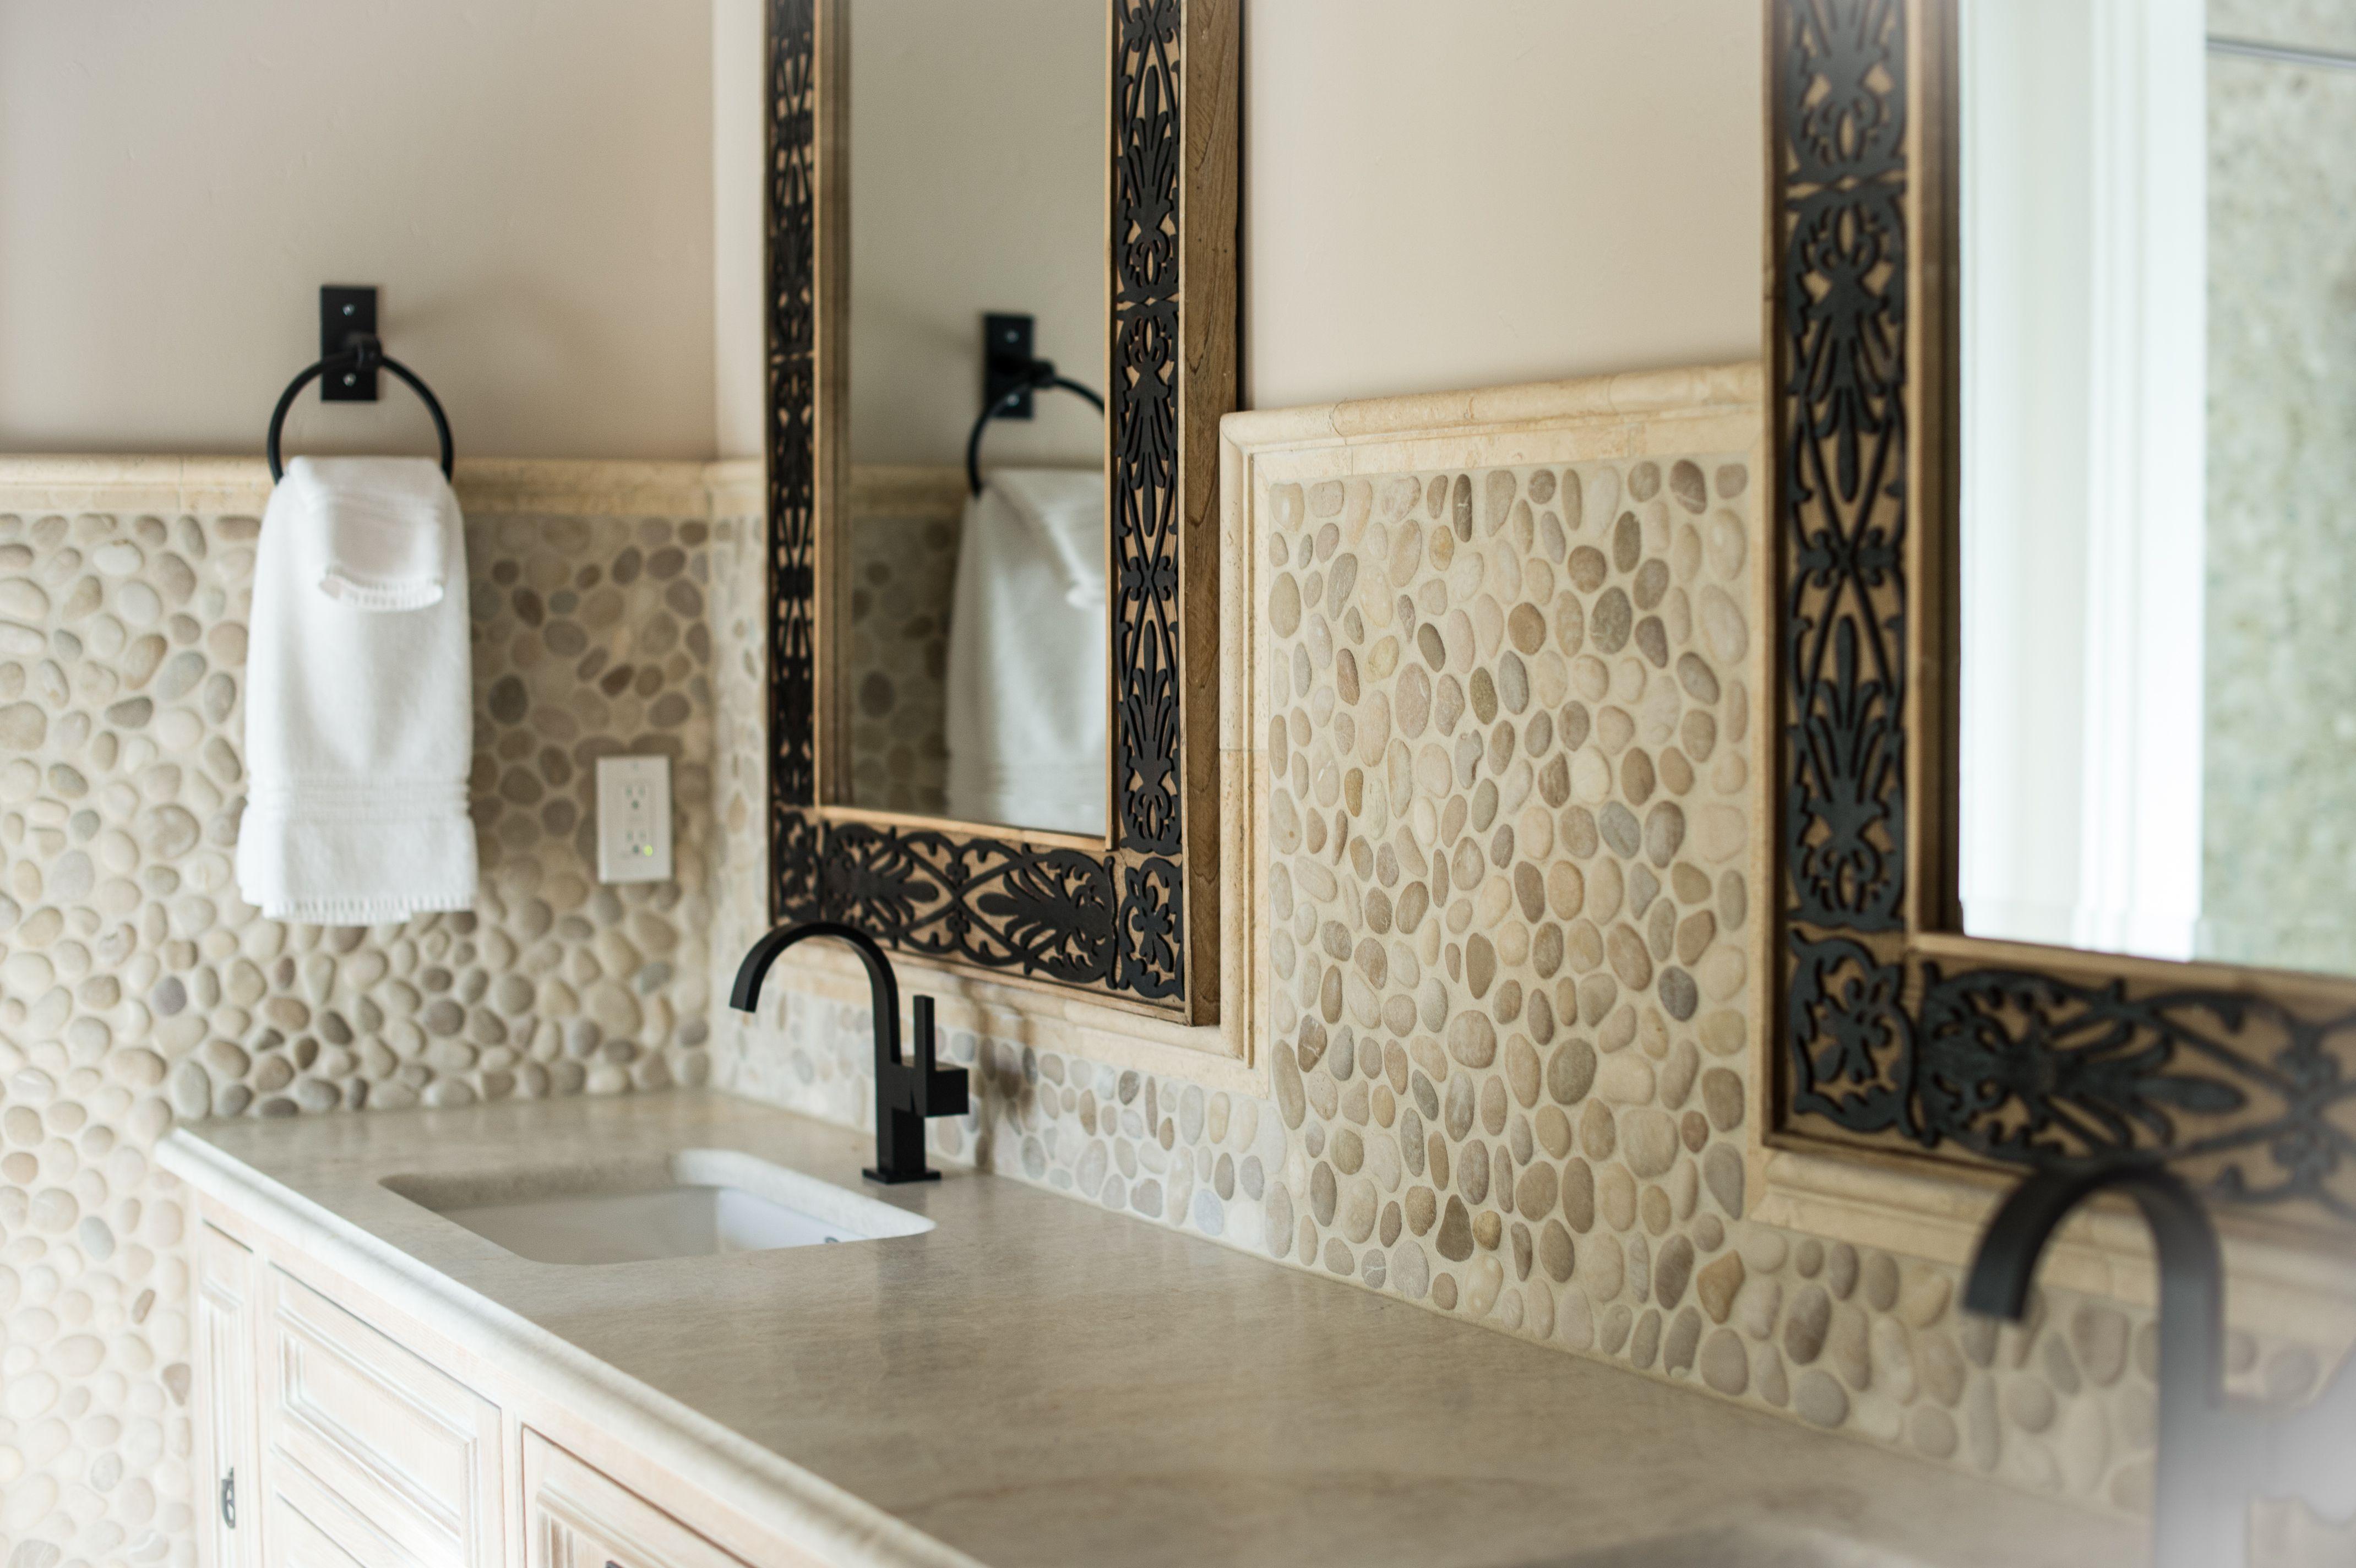 Java Tan Pebble Tile My Home Room Wall Tiles Bathroom